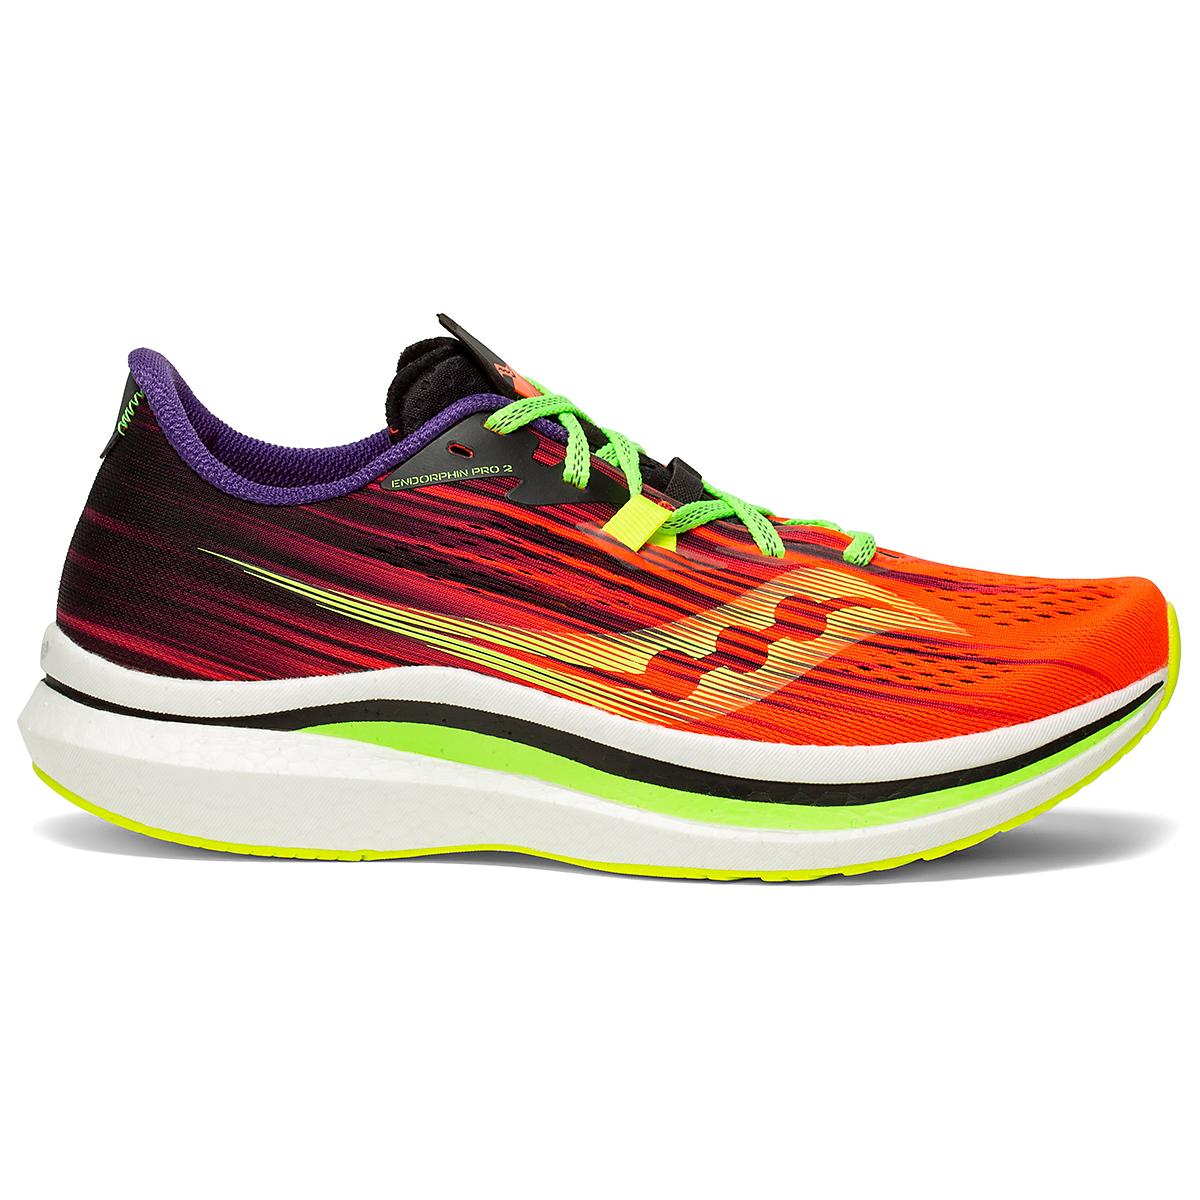 Men's Saucony Endorphin Pro 2 Running Shoe - Color: Vizipro - Size: 7 - Width: Regular, Vizipro, large, image 1